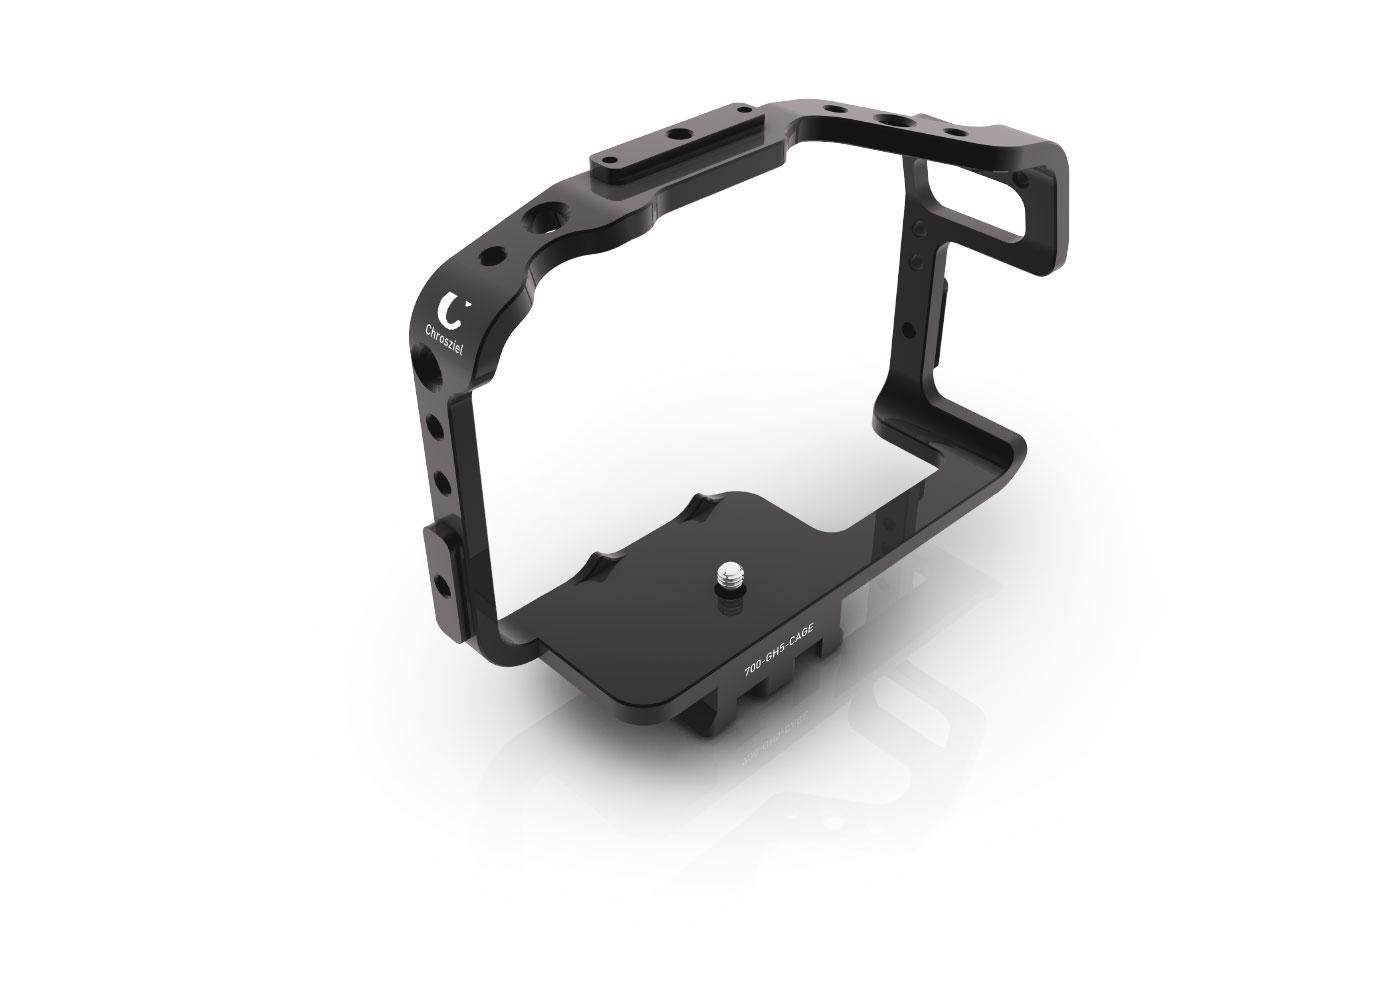 Chrosziel Kamera Cage für Panasonic GH5